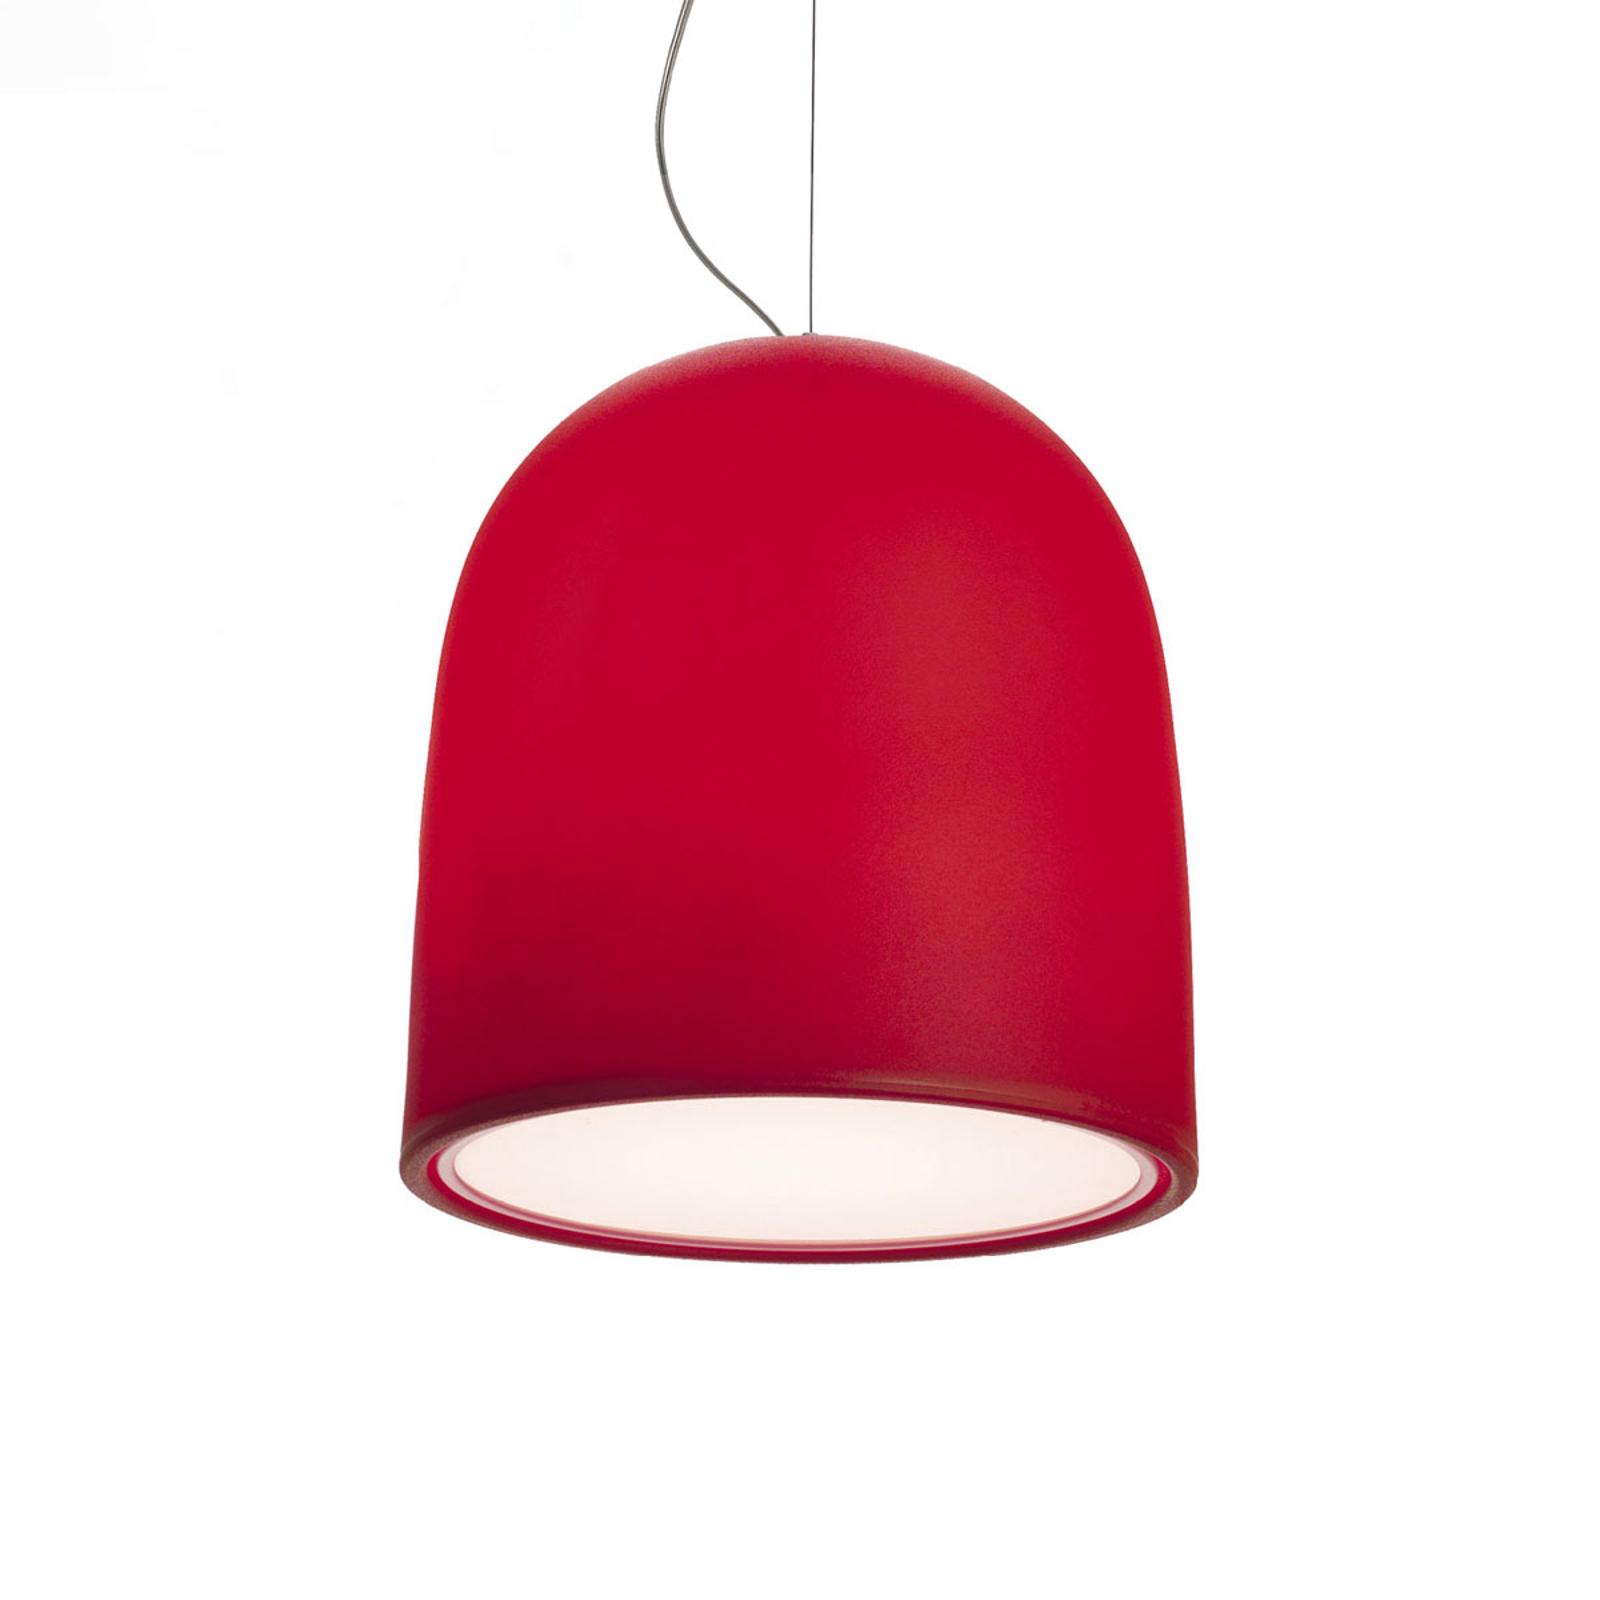 Modo Luce Campanone hanglamp Ø 33 cm rood